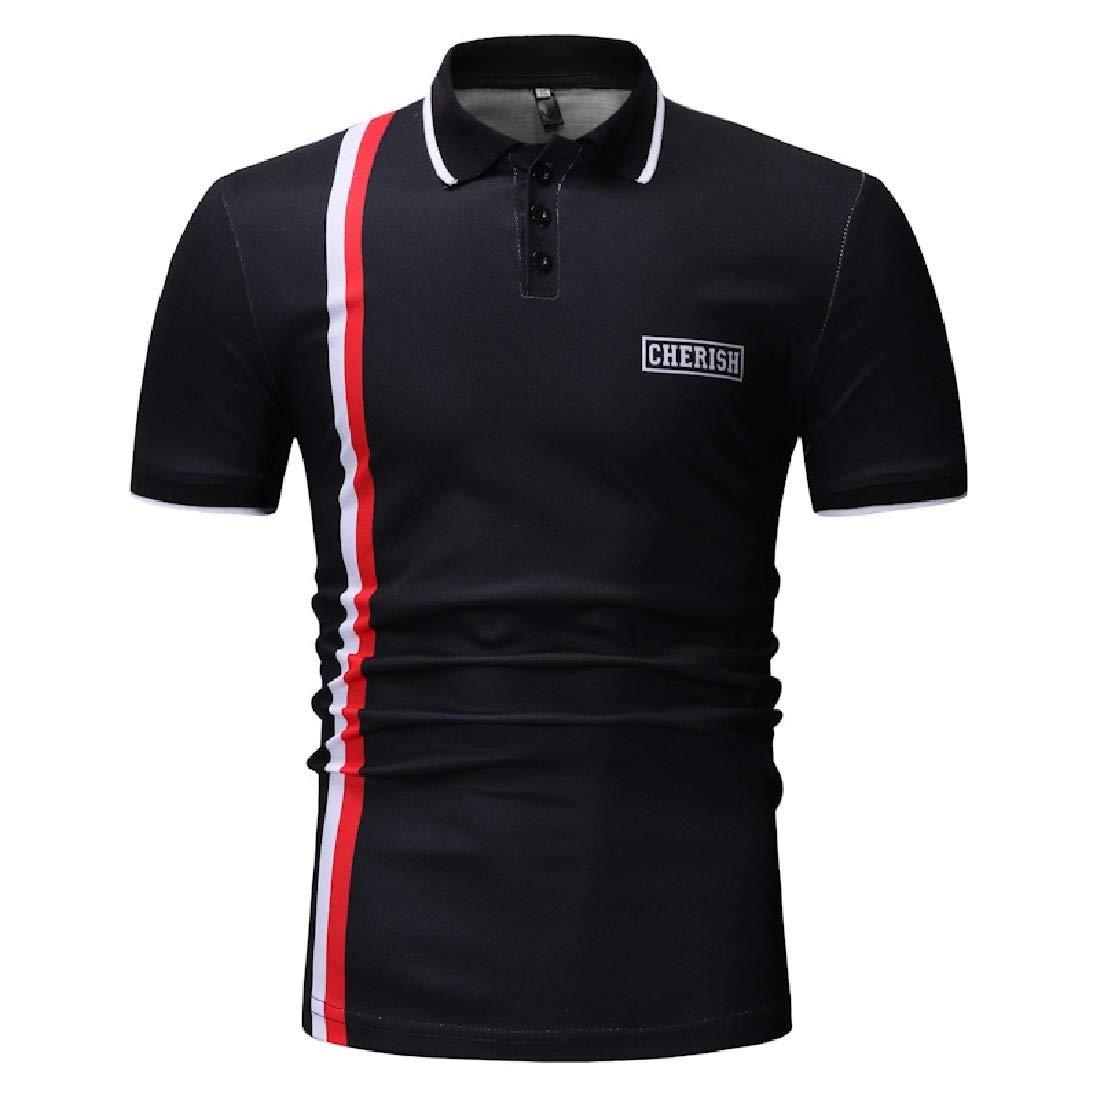 VividYou Mens Summer Simple Comfy T-Shirts Loose Short Sleeve Polo Shirt